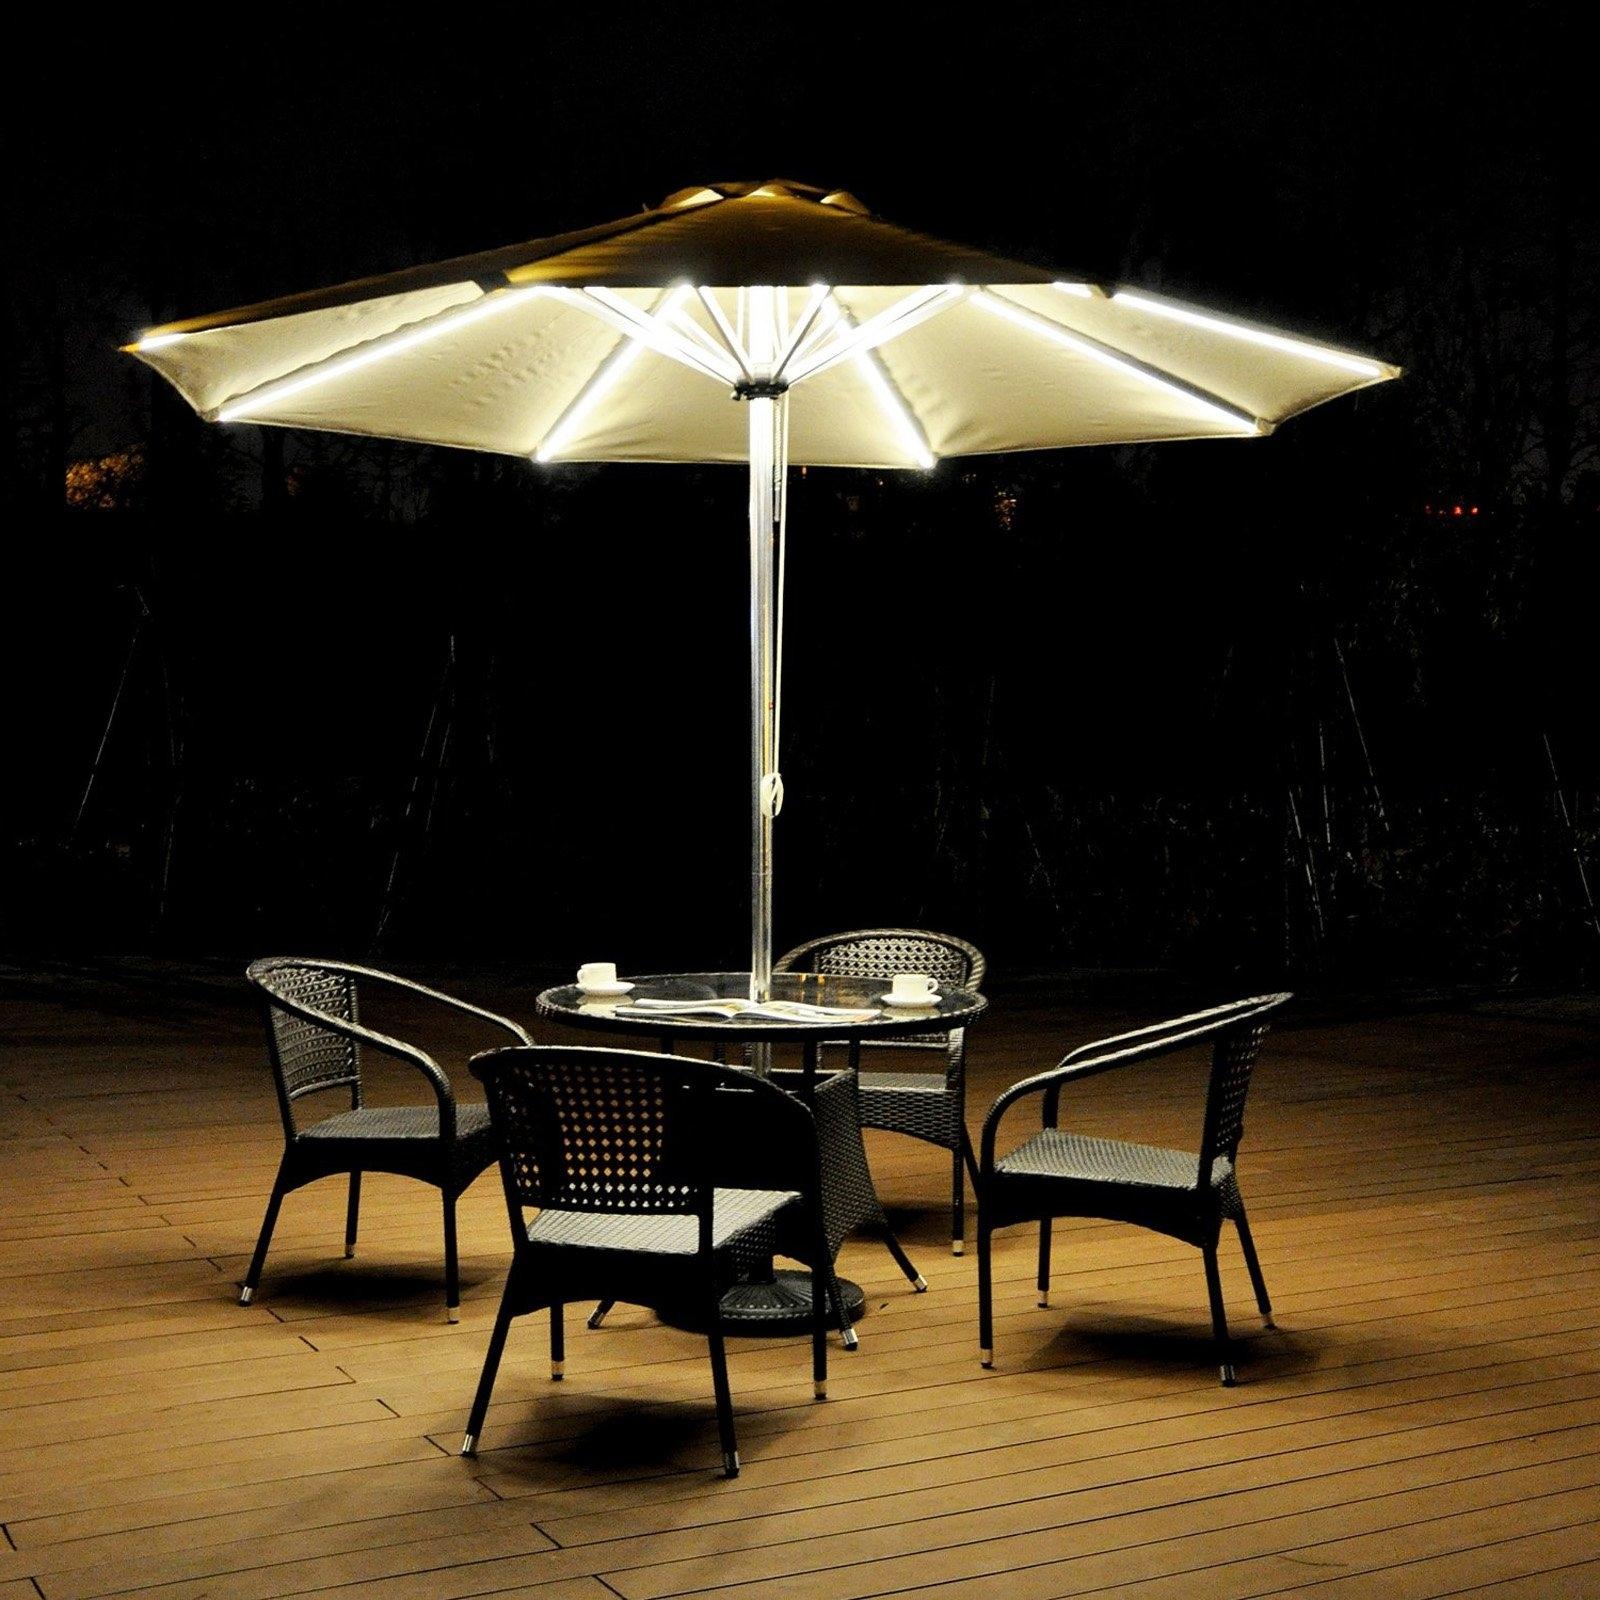 Outdoor Umbrella Lanterns Pertaining To Preferred Outdoor Umbrella With Lights – Outdoor Lighting Ideas (View 13 of 20)